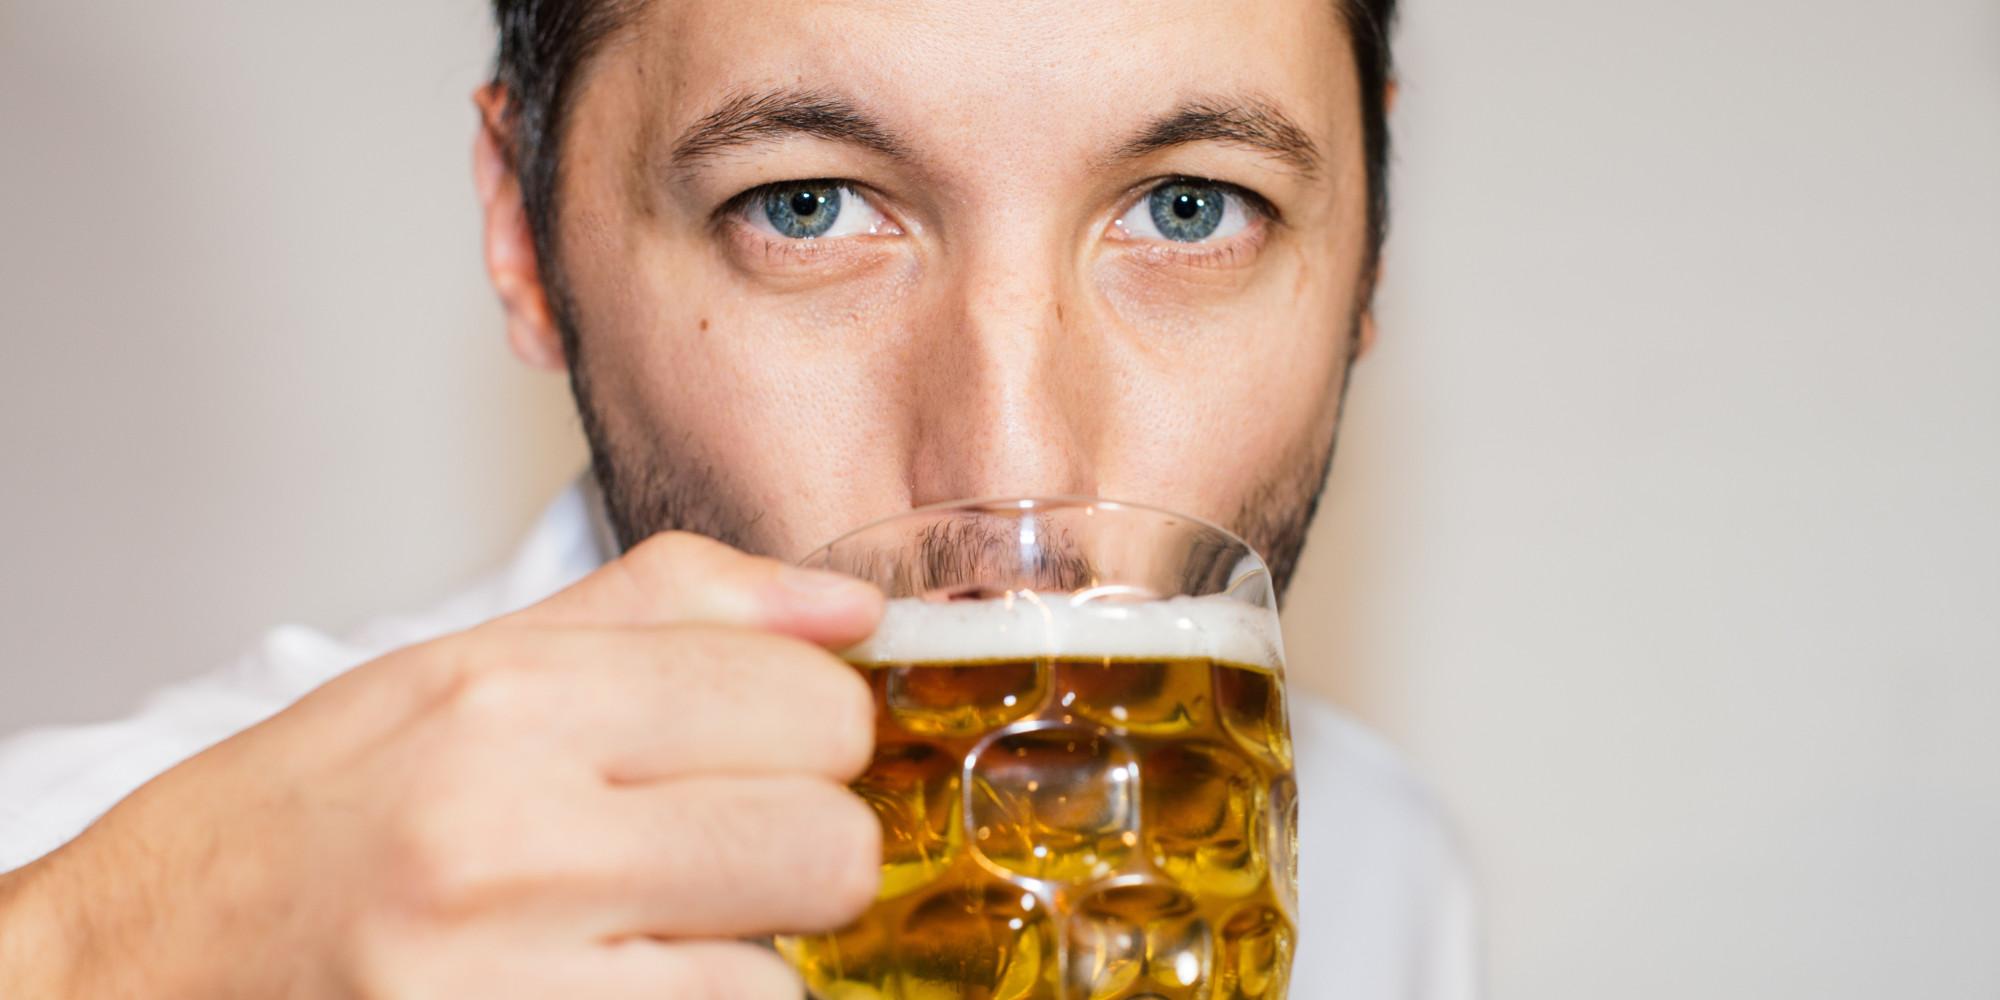 Почему люди пьют пиво